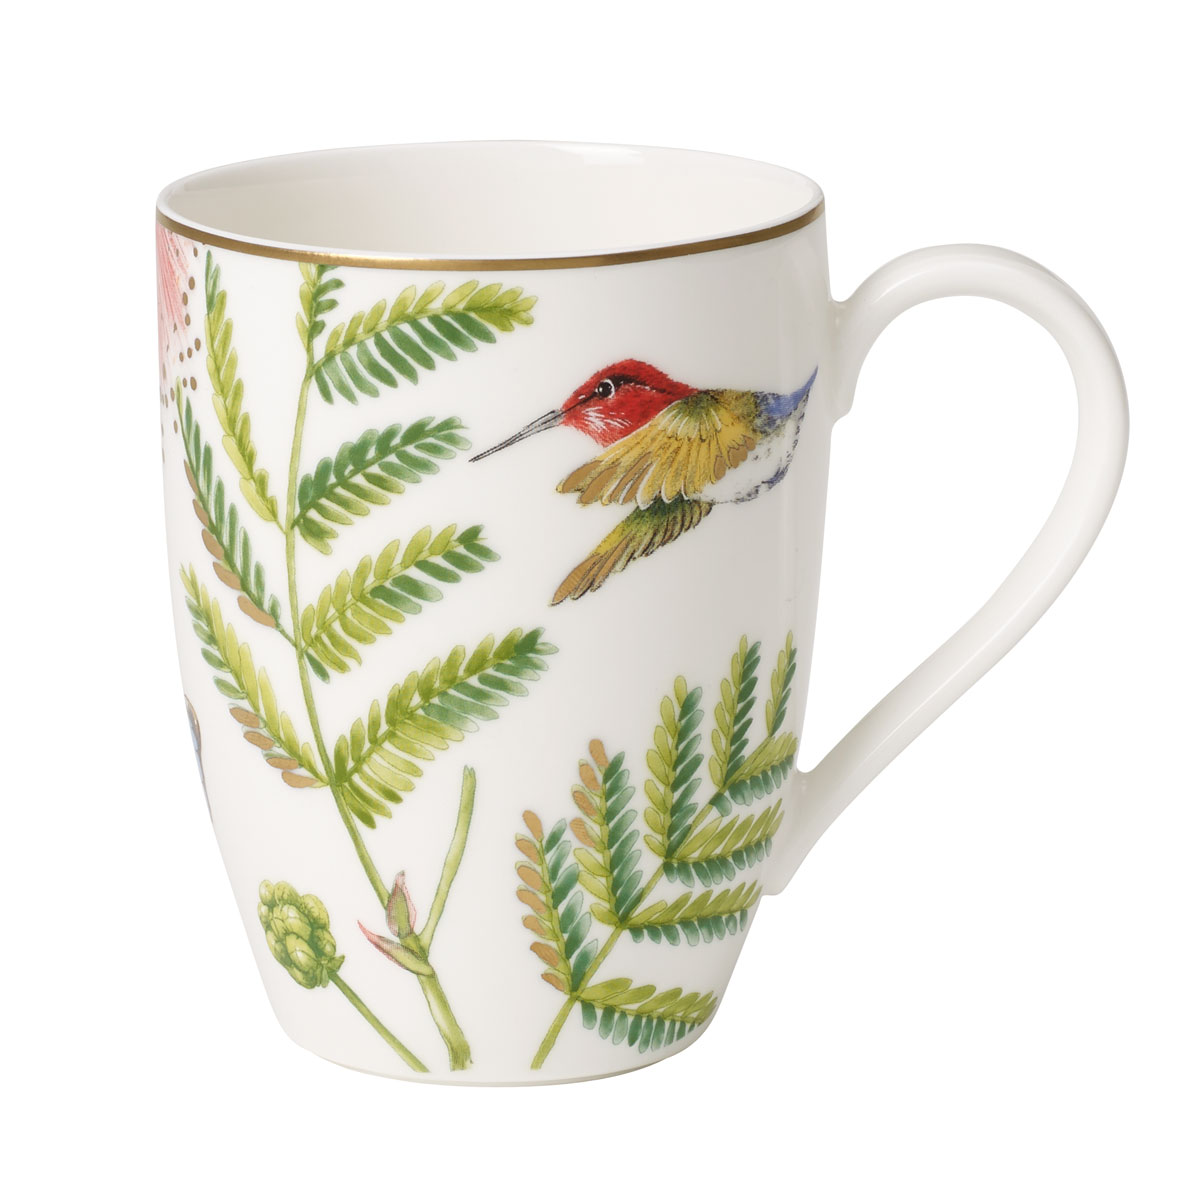 Villeroy and Boch Amazonia Anmut Mug